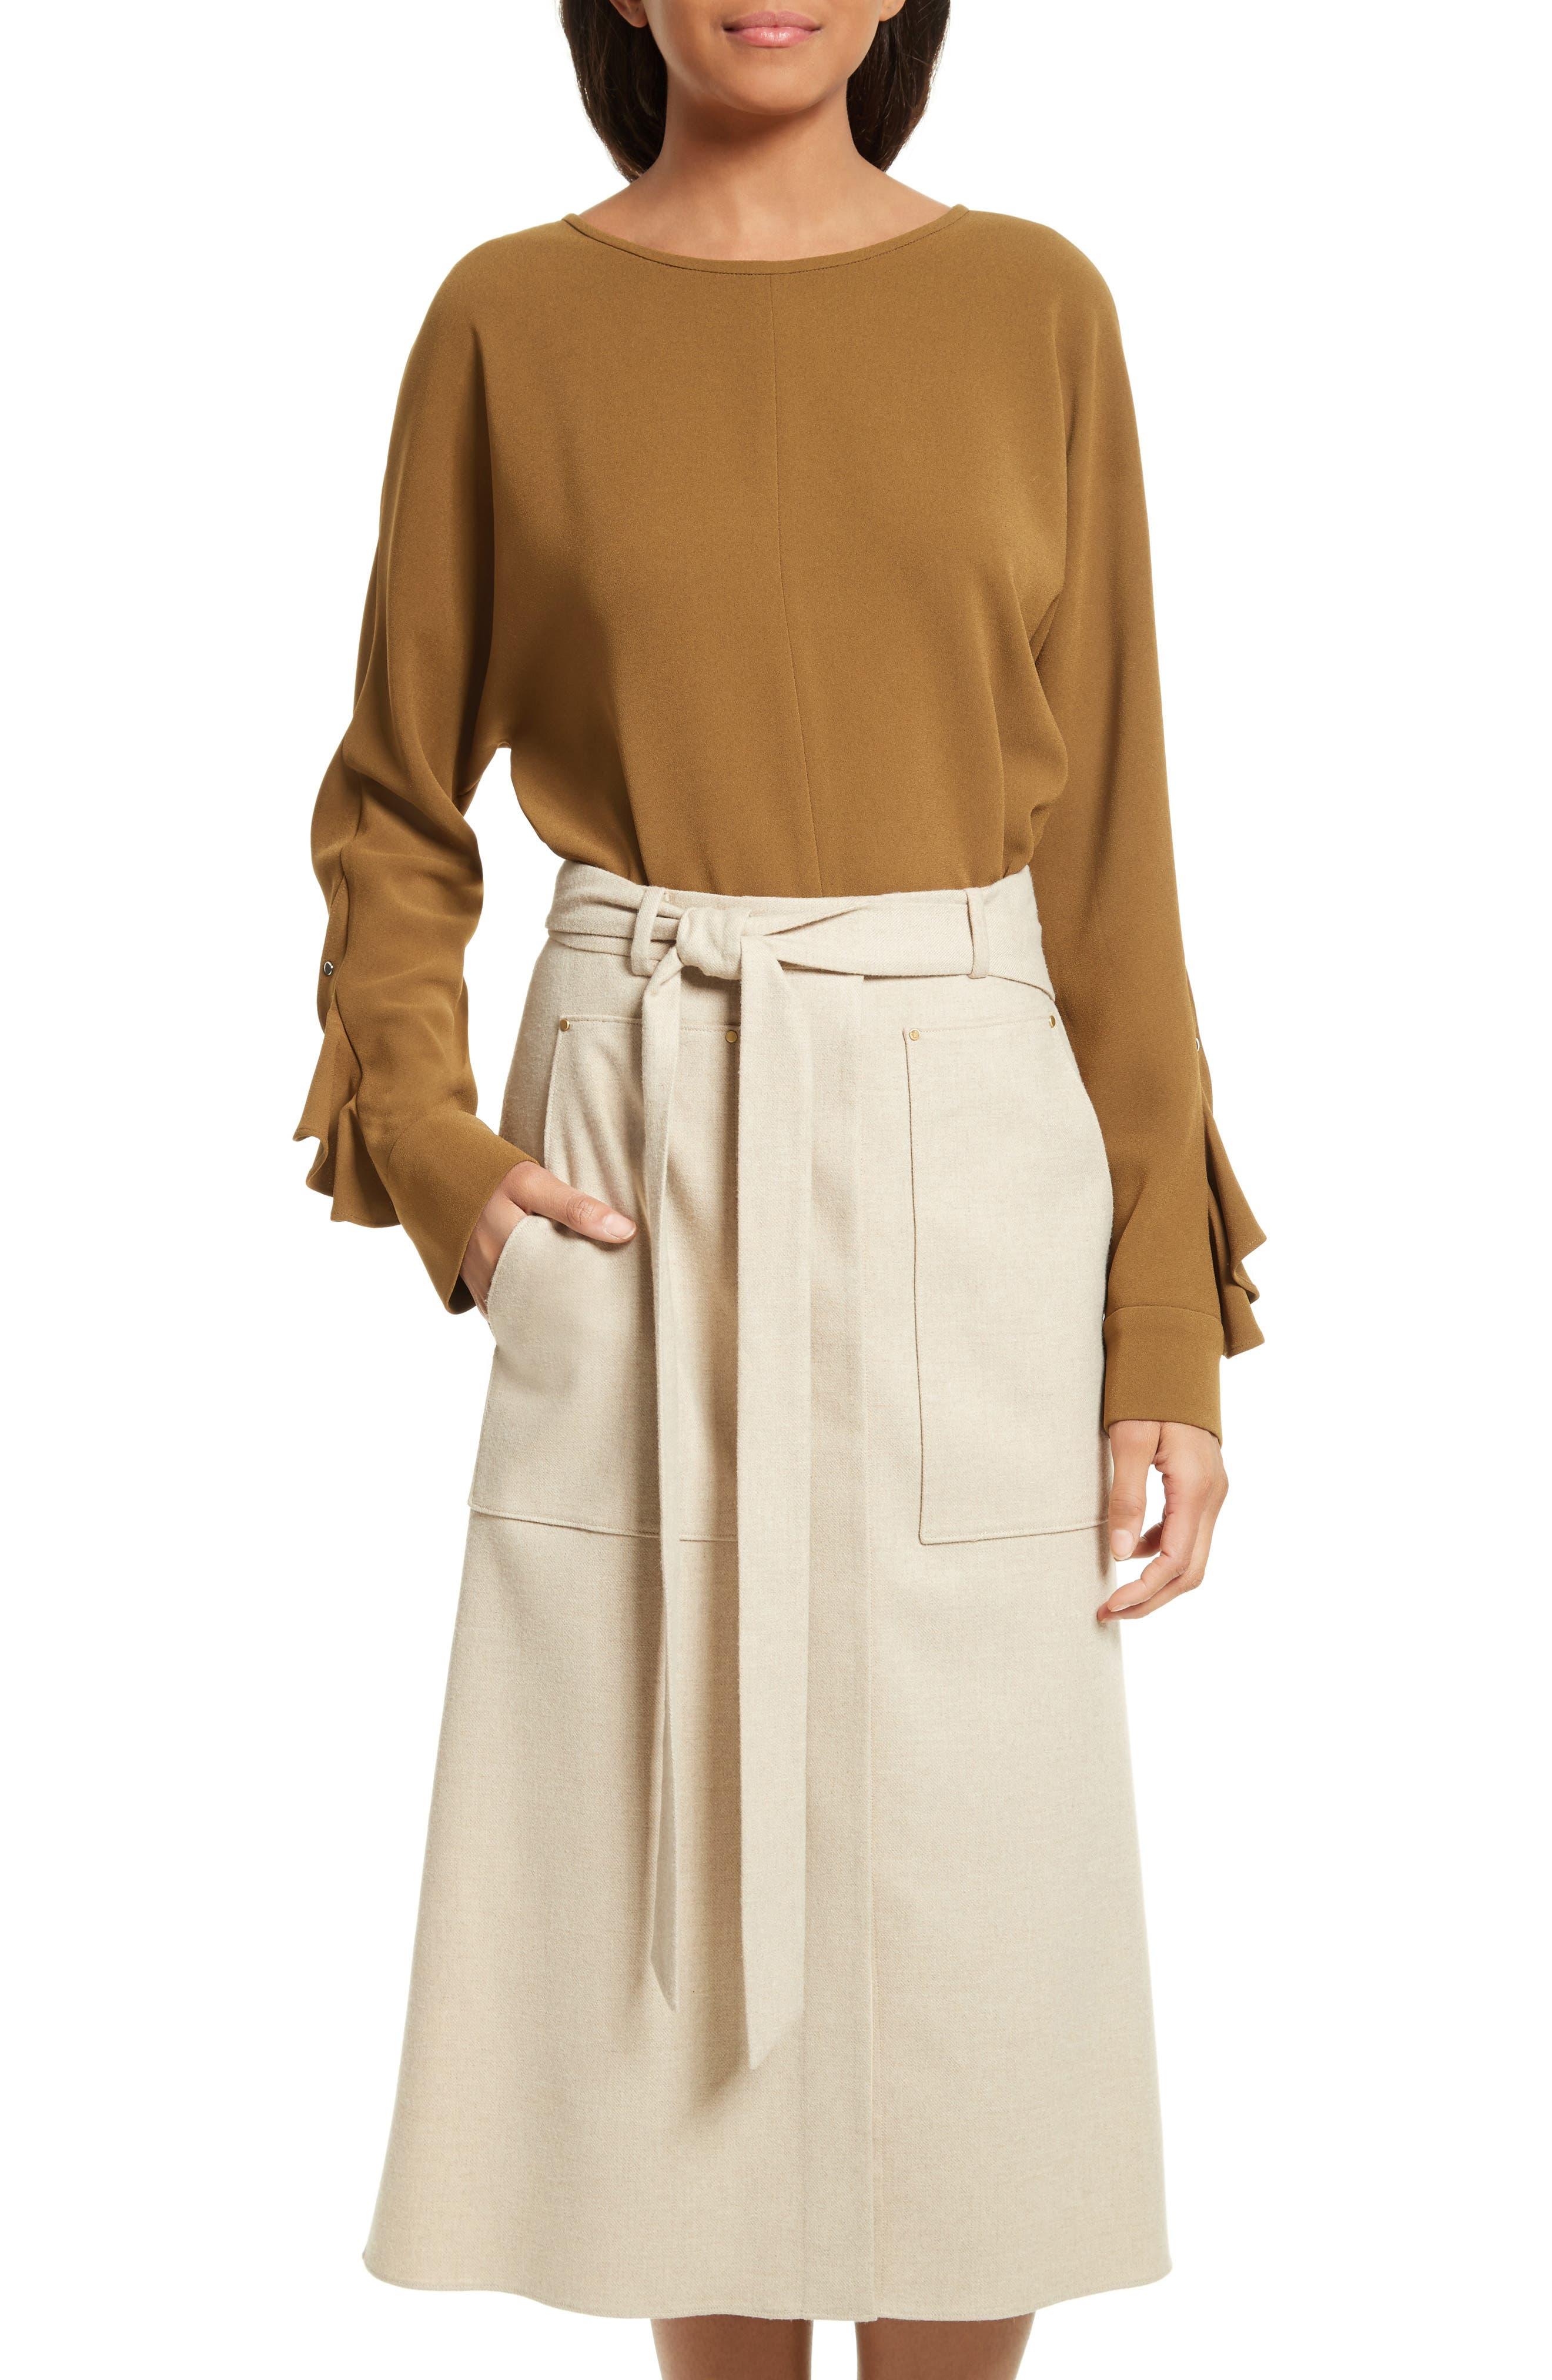 Ruffle Sleeve Dolman Top,                         Main,                         color, 310